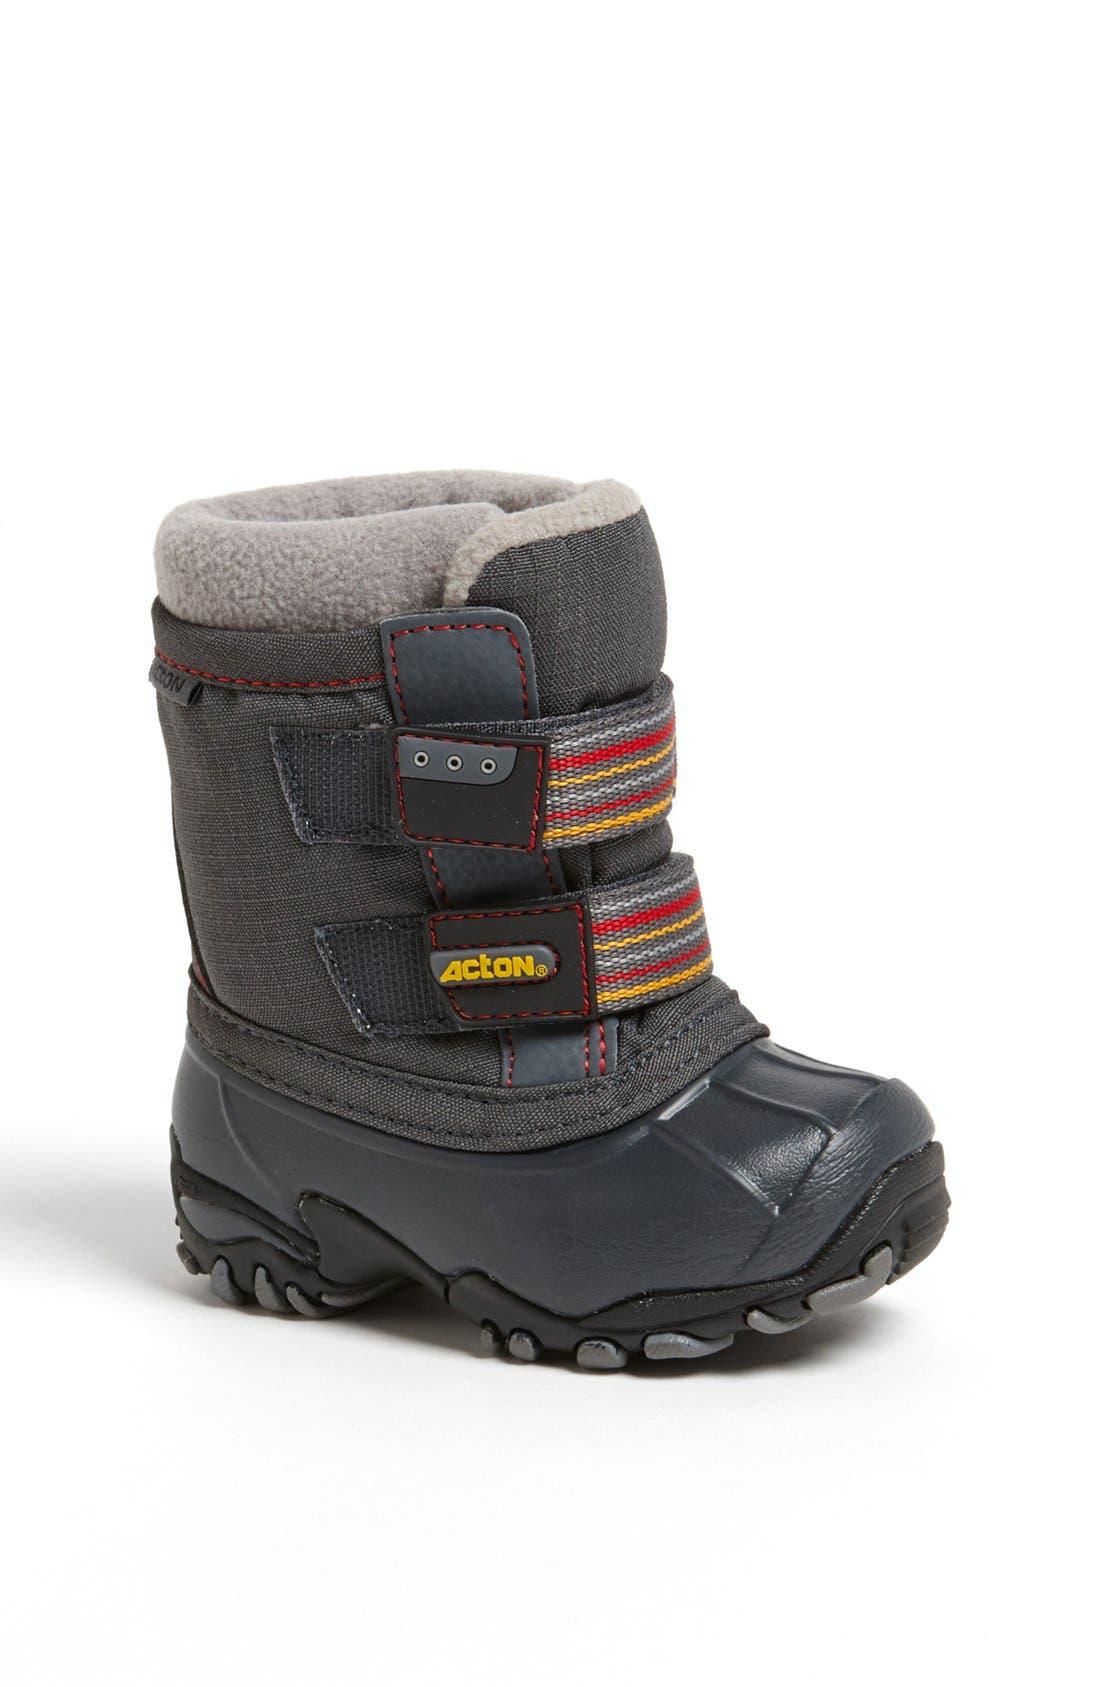 Alternate Image 1 Selected - Acton 'Lullaby' Waterproof Winter Boot (Walker & Toddler)